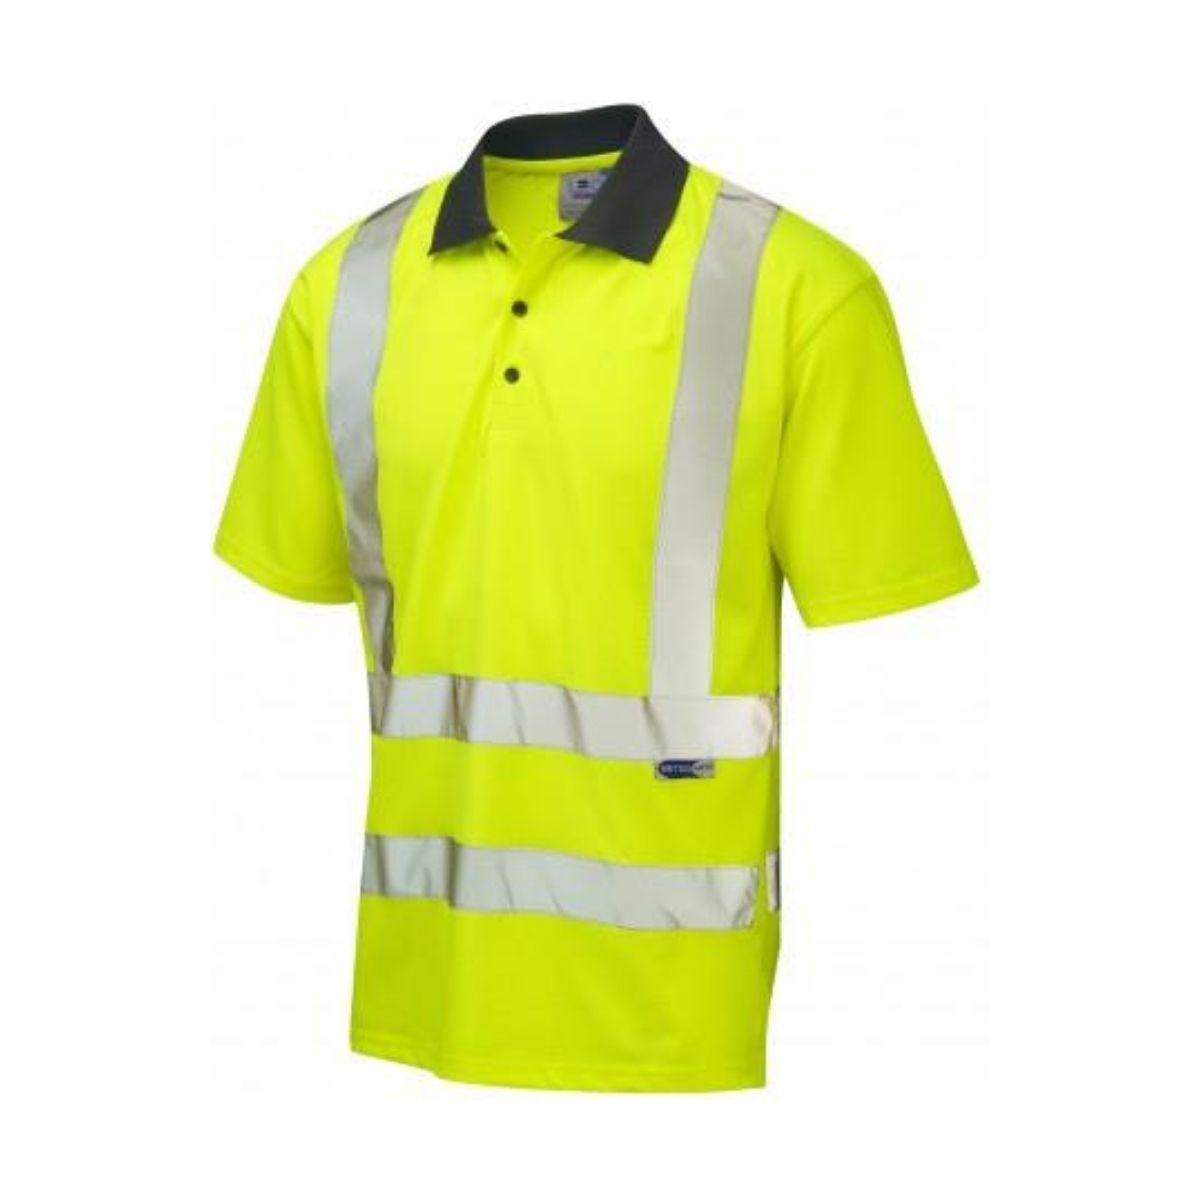 HV5000 Hi-Vis Polo Shirt Polycotton 175gsm - Yellow